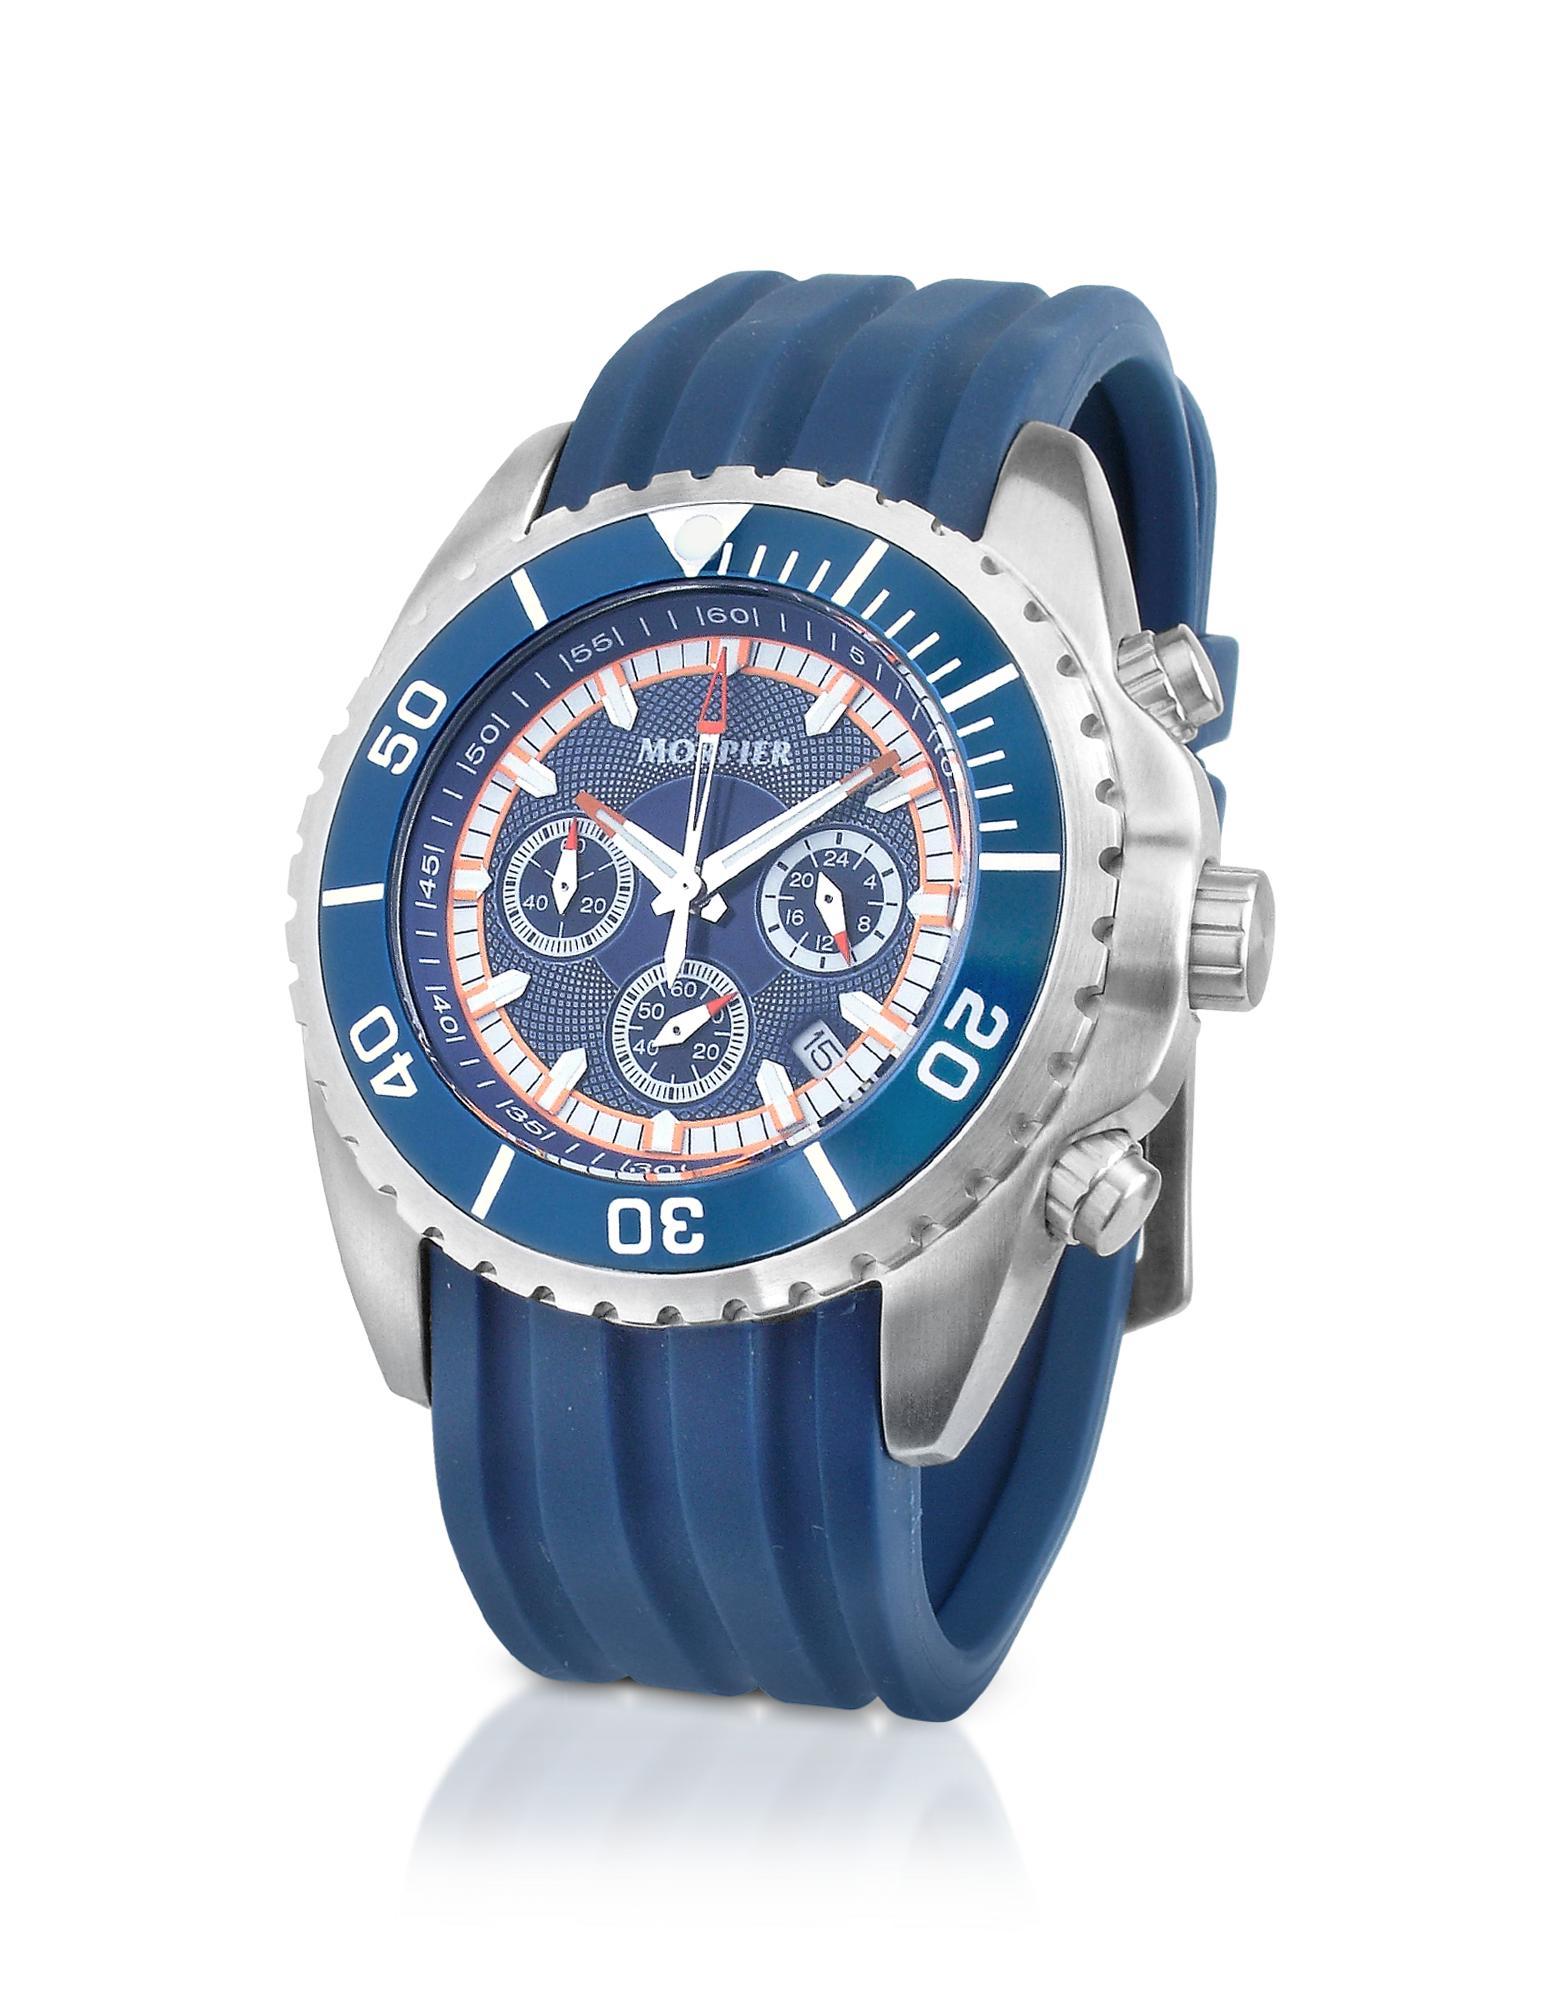 Morpier Firenze  Ocean - Blue Stainless Steel & Rubber Dive Chrono Watch